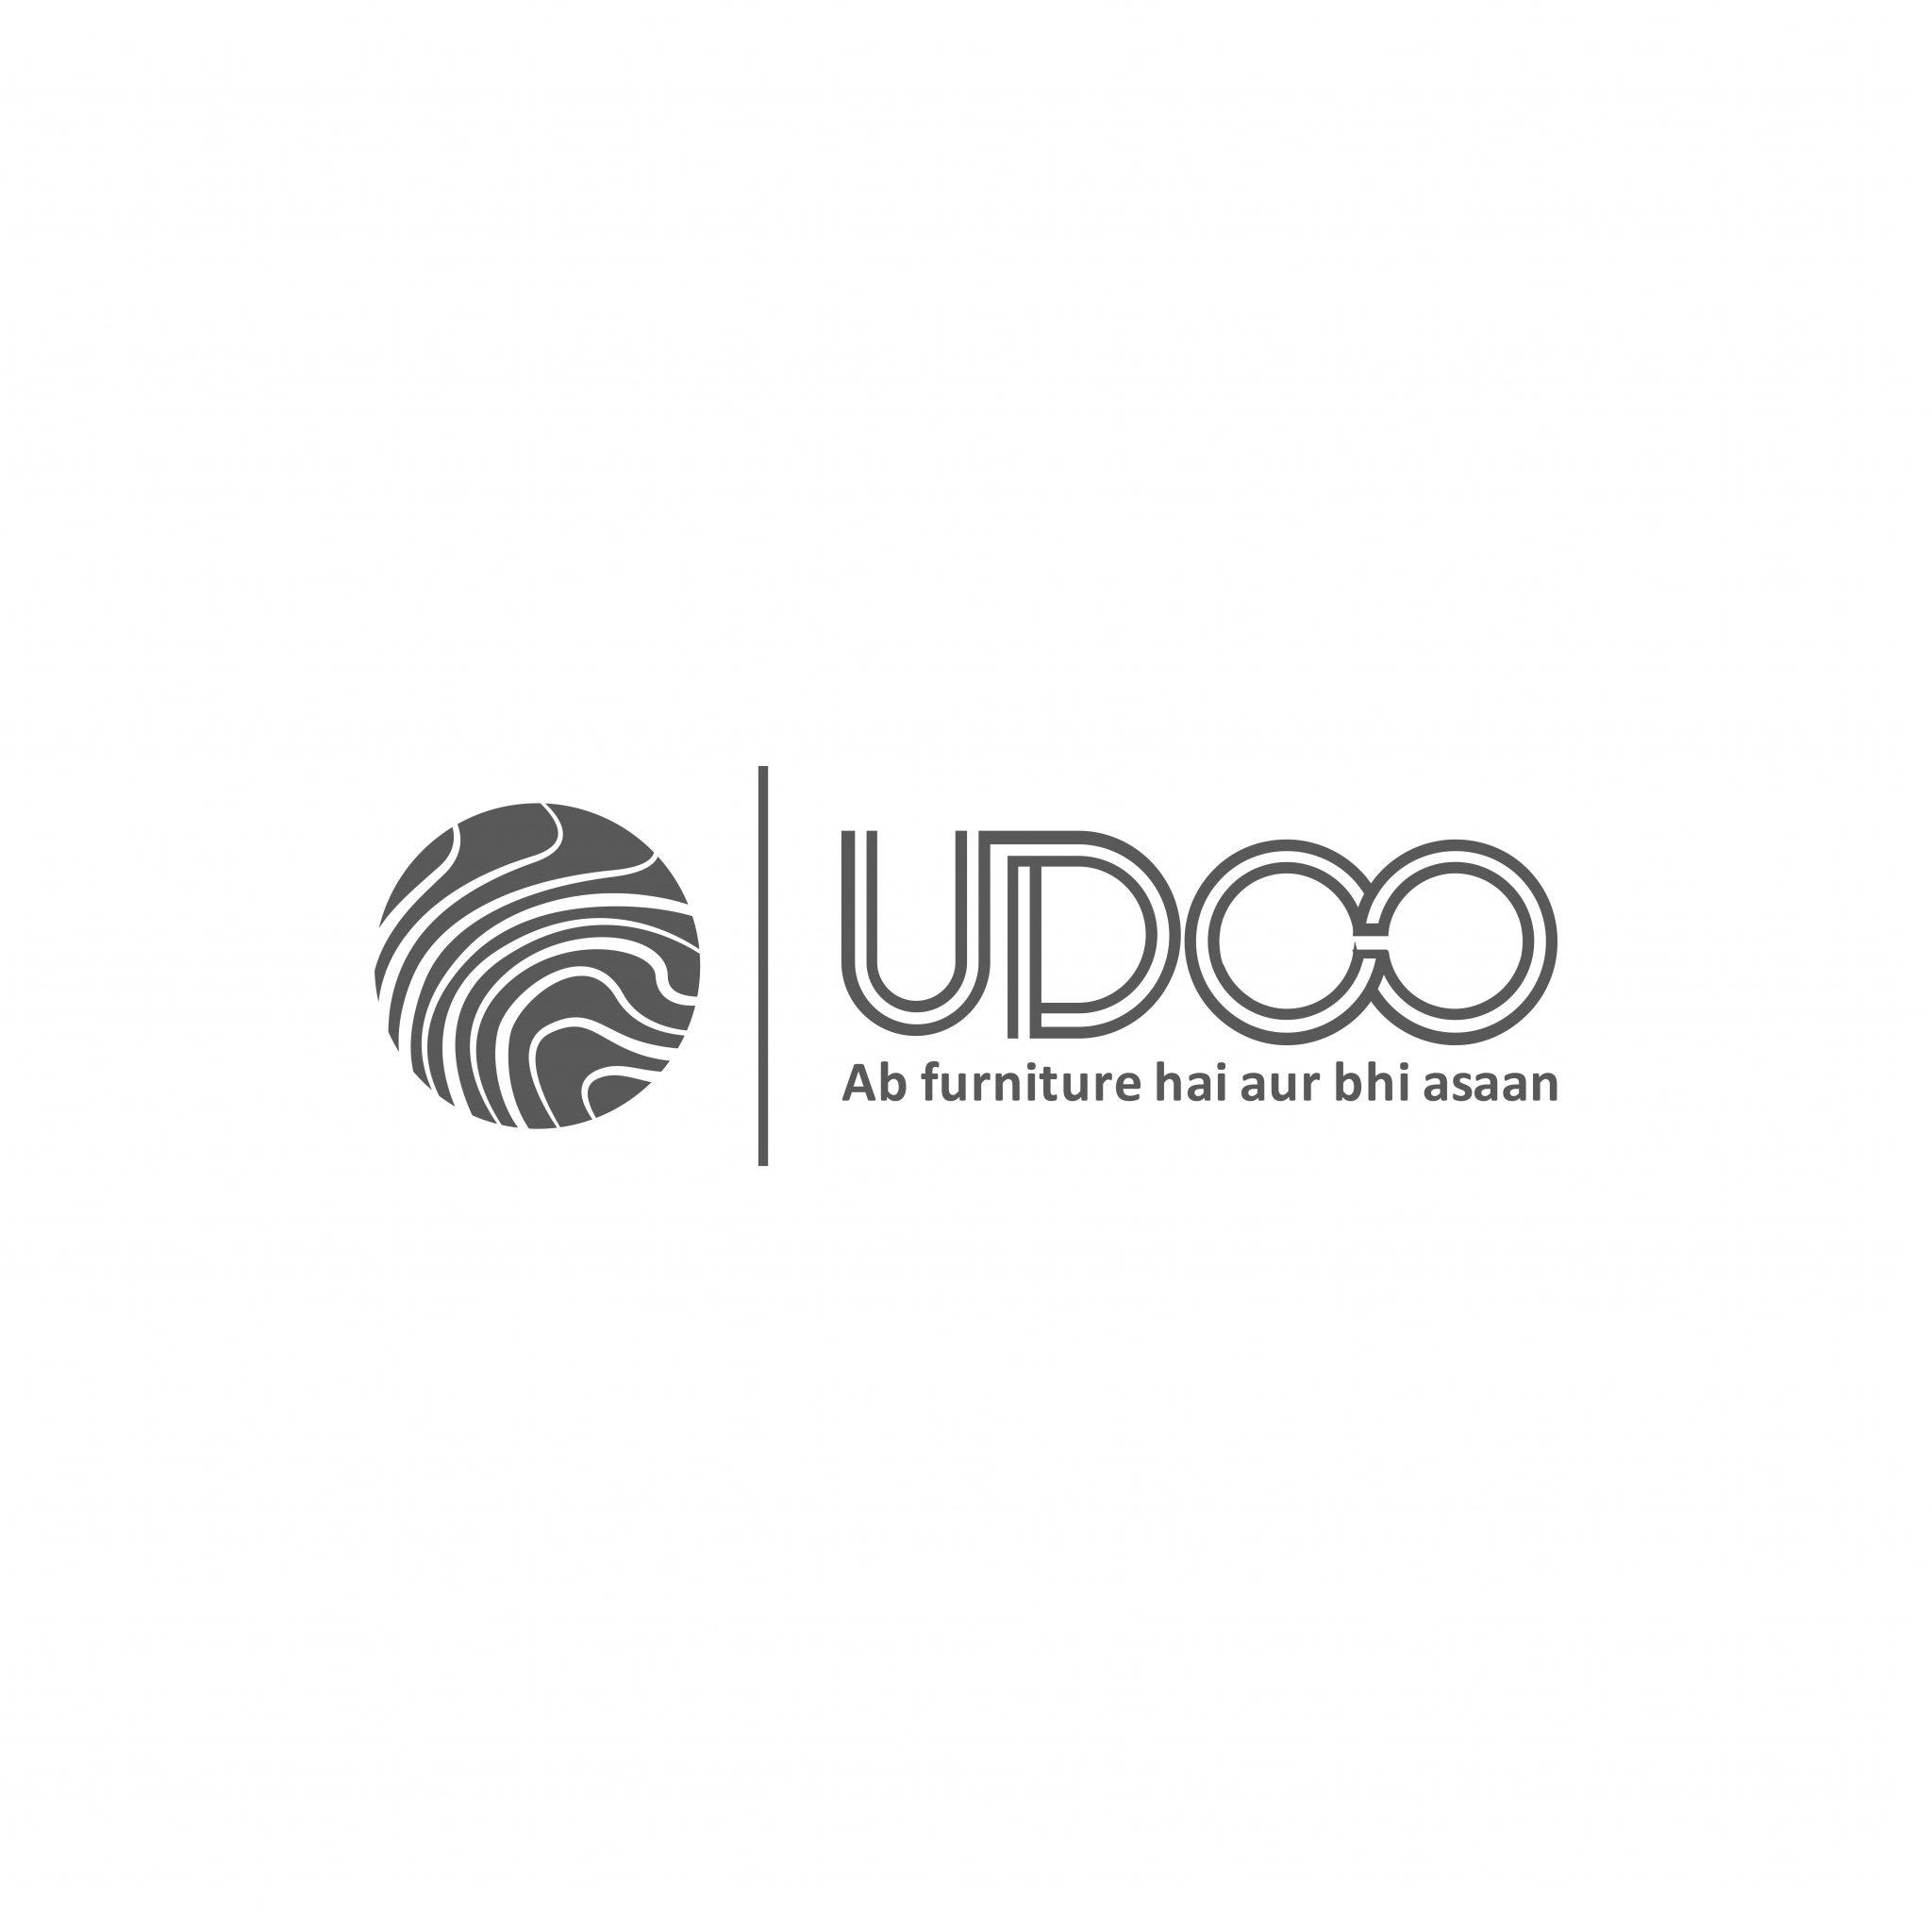 udoo_final-logo